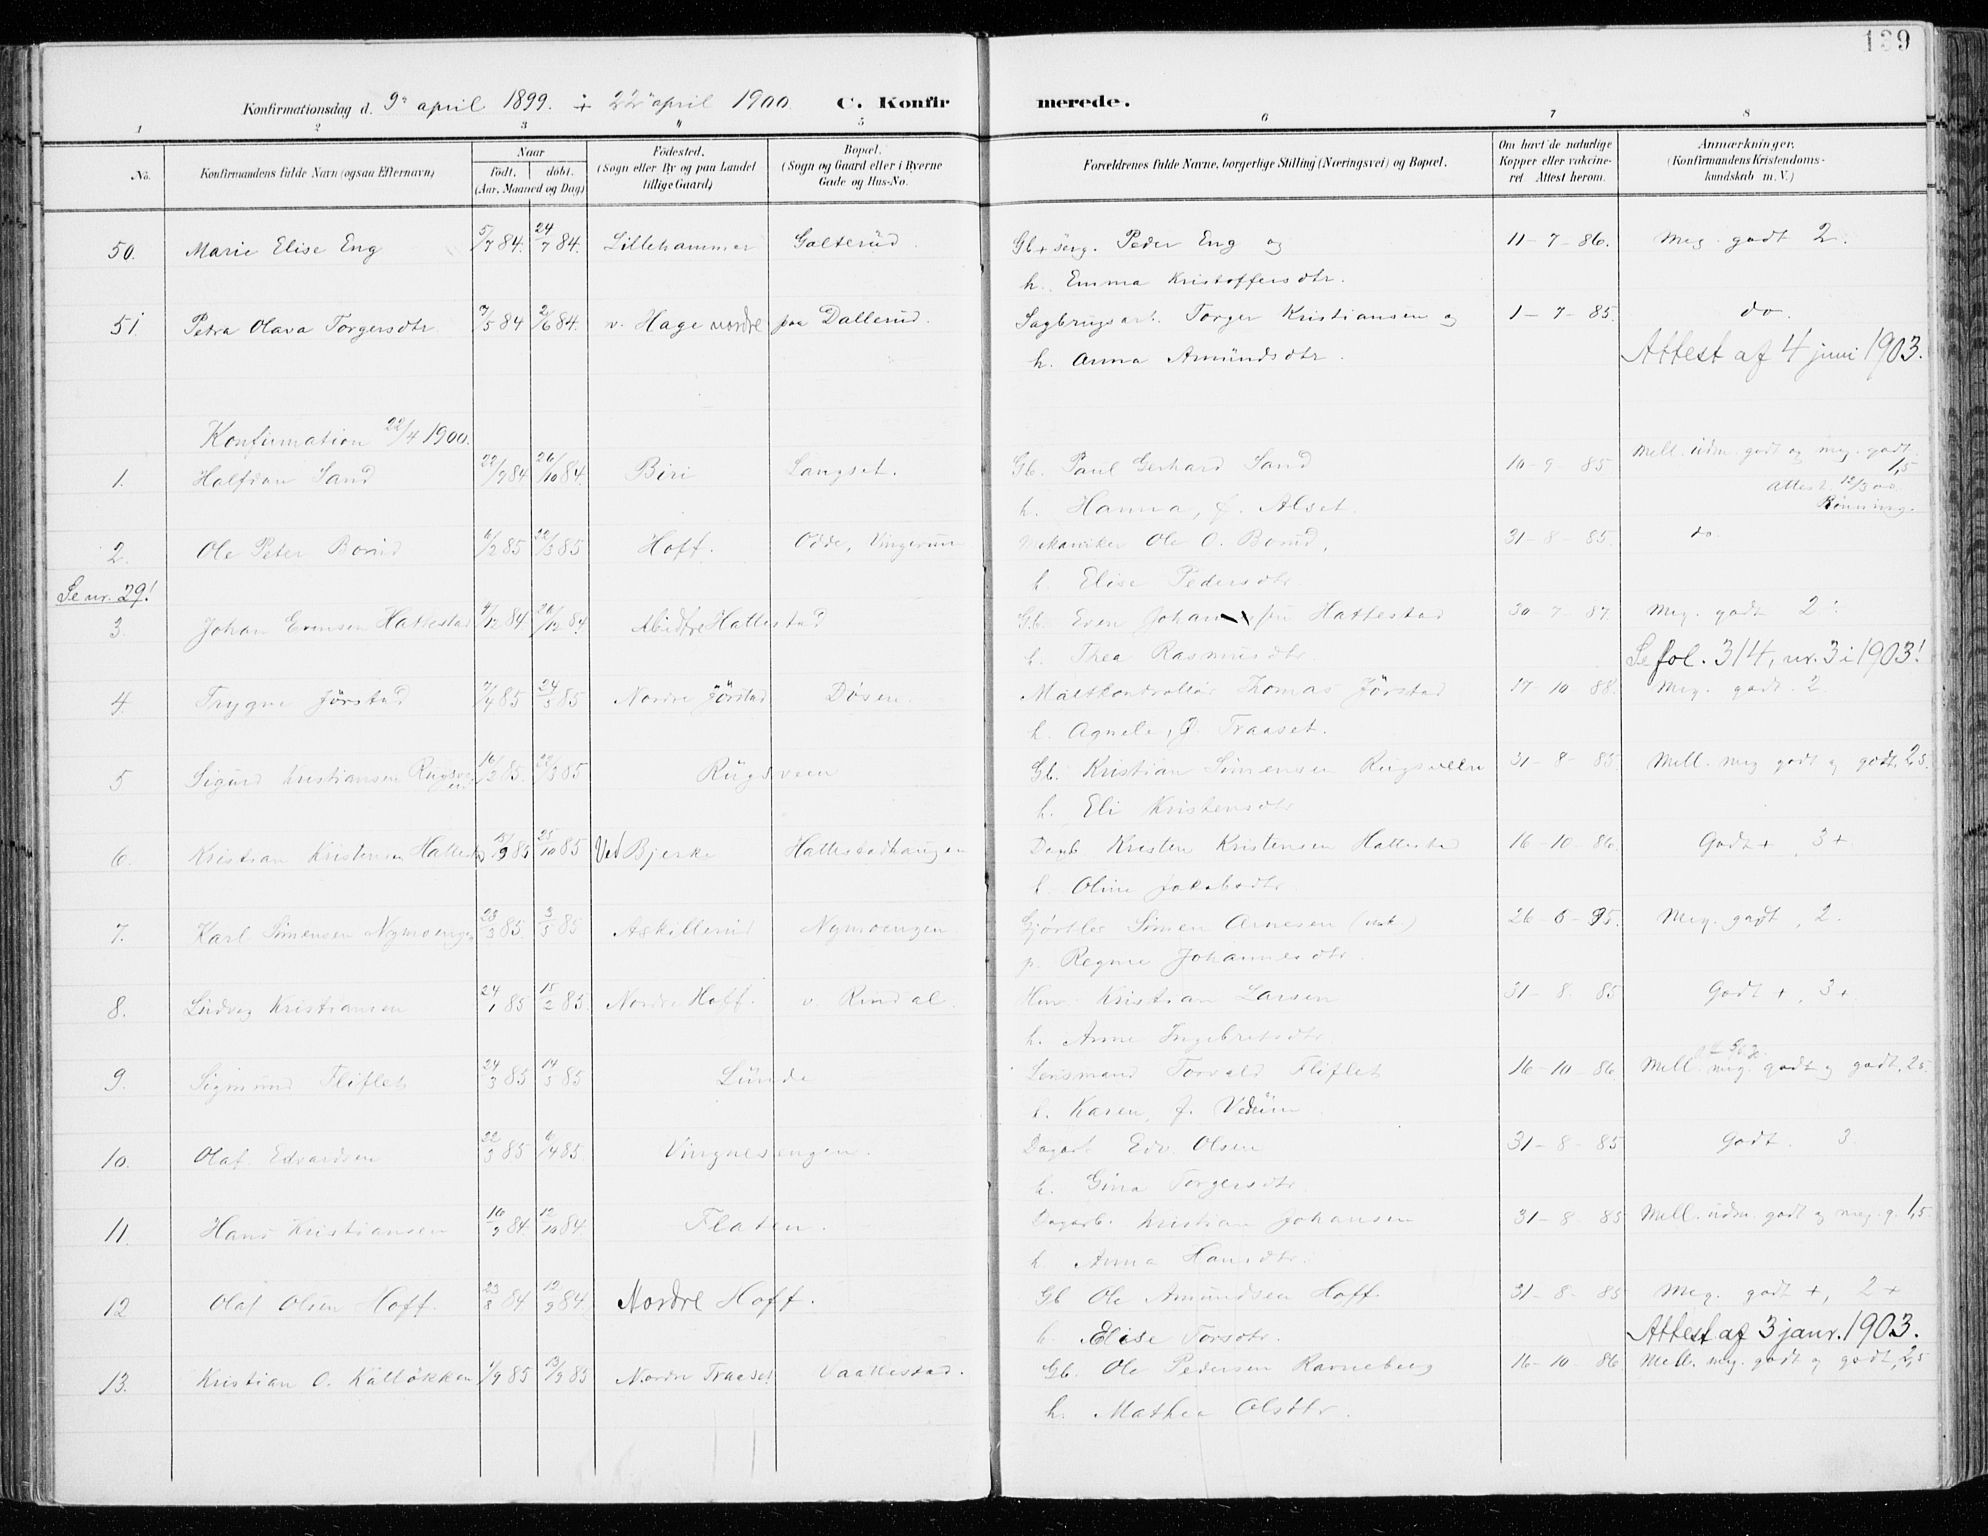 SAH, Fåberg prestekontor, Ministerialbok nr. 11, 1899-1913, s. 139